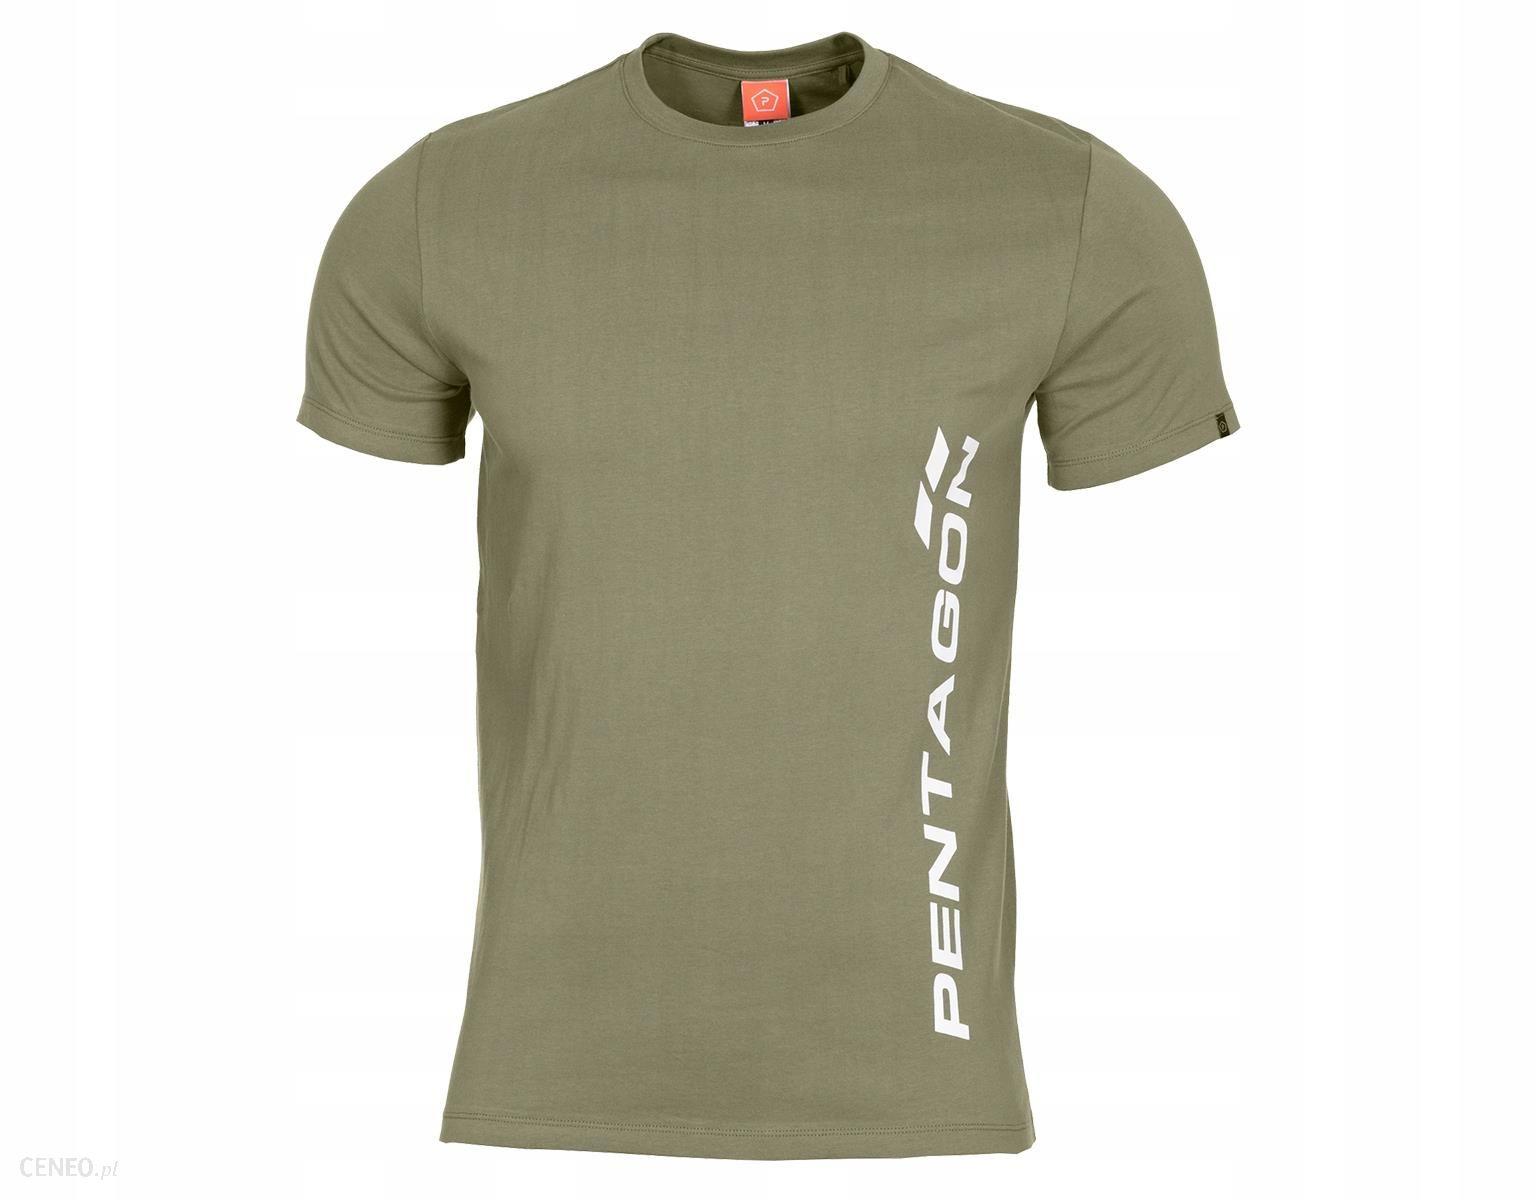 Koszulka T-shirt Pentagon Vertical Olive 3XL